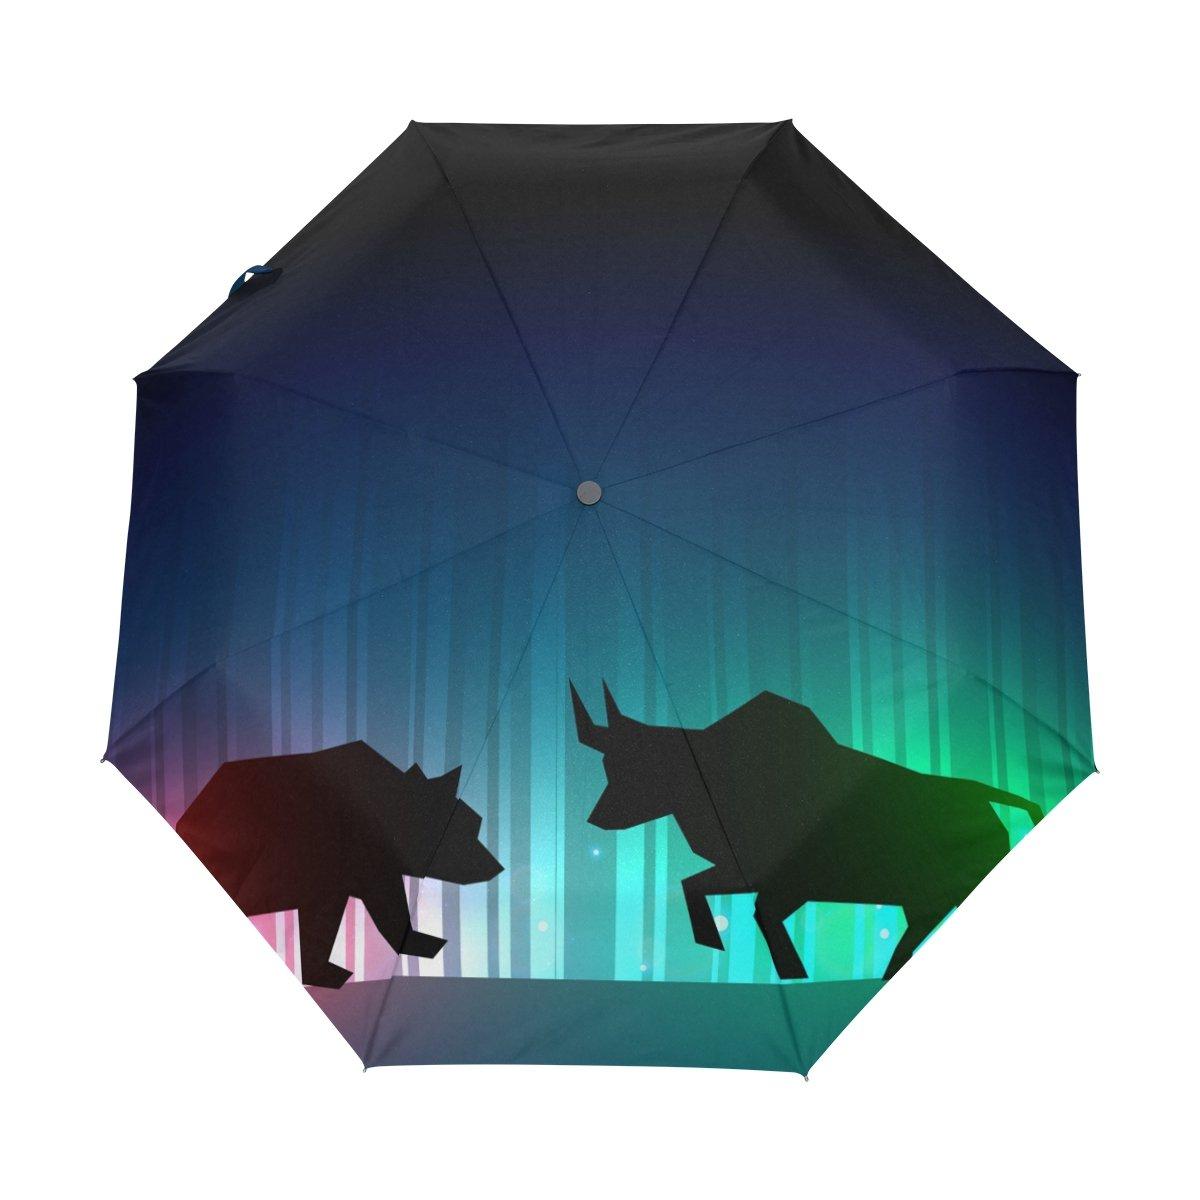 Senya Saobao防風と防雨トラベル傘with自動開いて閉じFolding Bull and Bearポータブル折りたたみ式太陽雨傘 B07FDWLJ9C